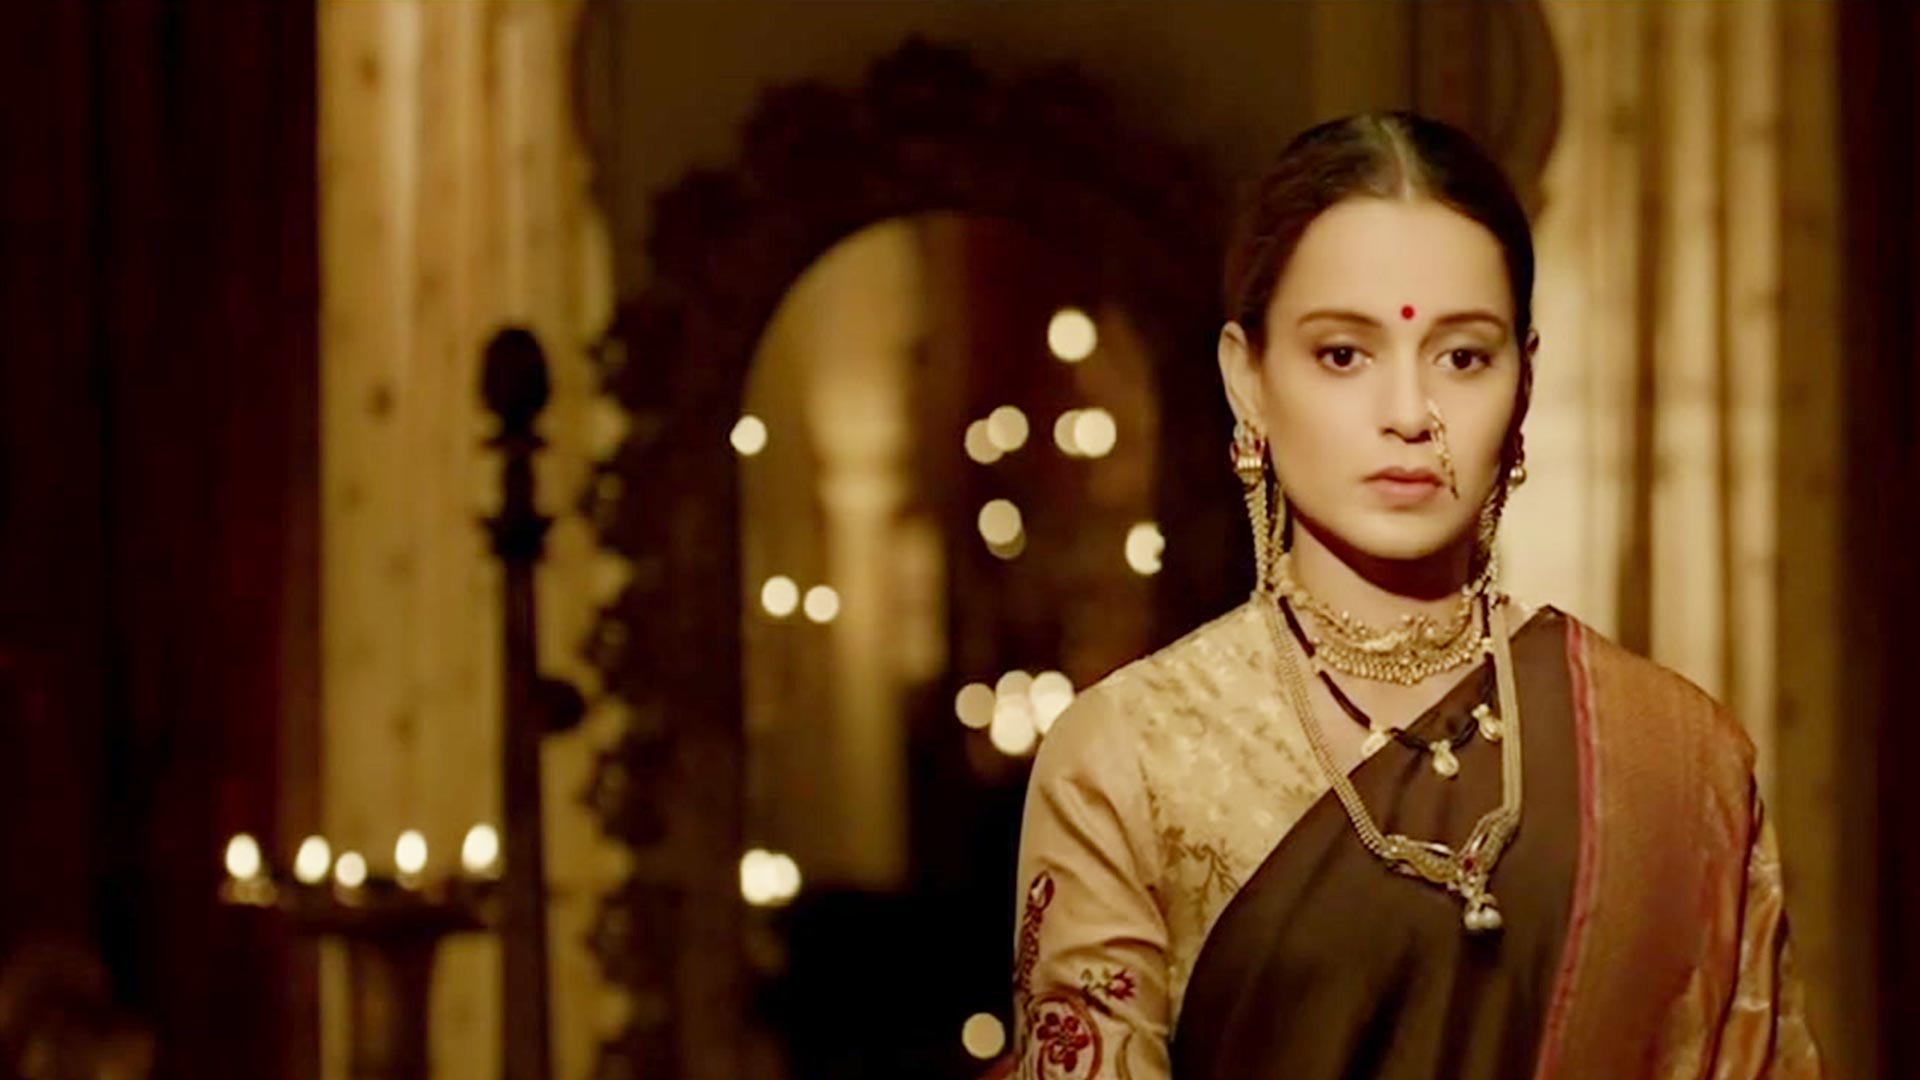 Amazon com: Watch Manikarnika: The Queen of Jhansi (Hindi) | Prime Video